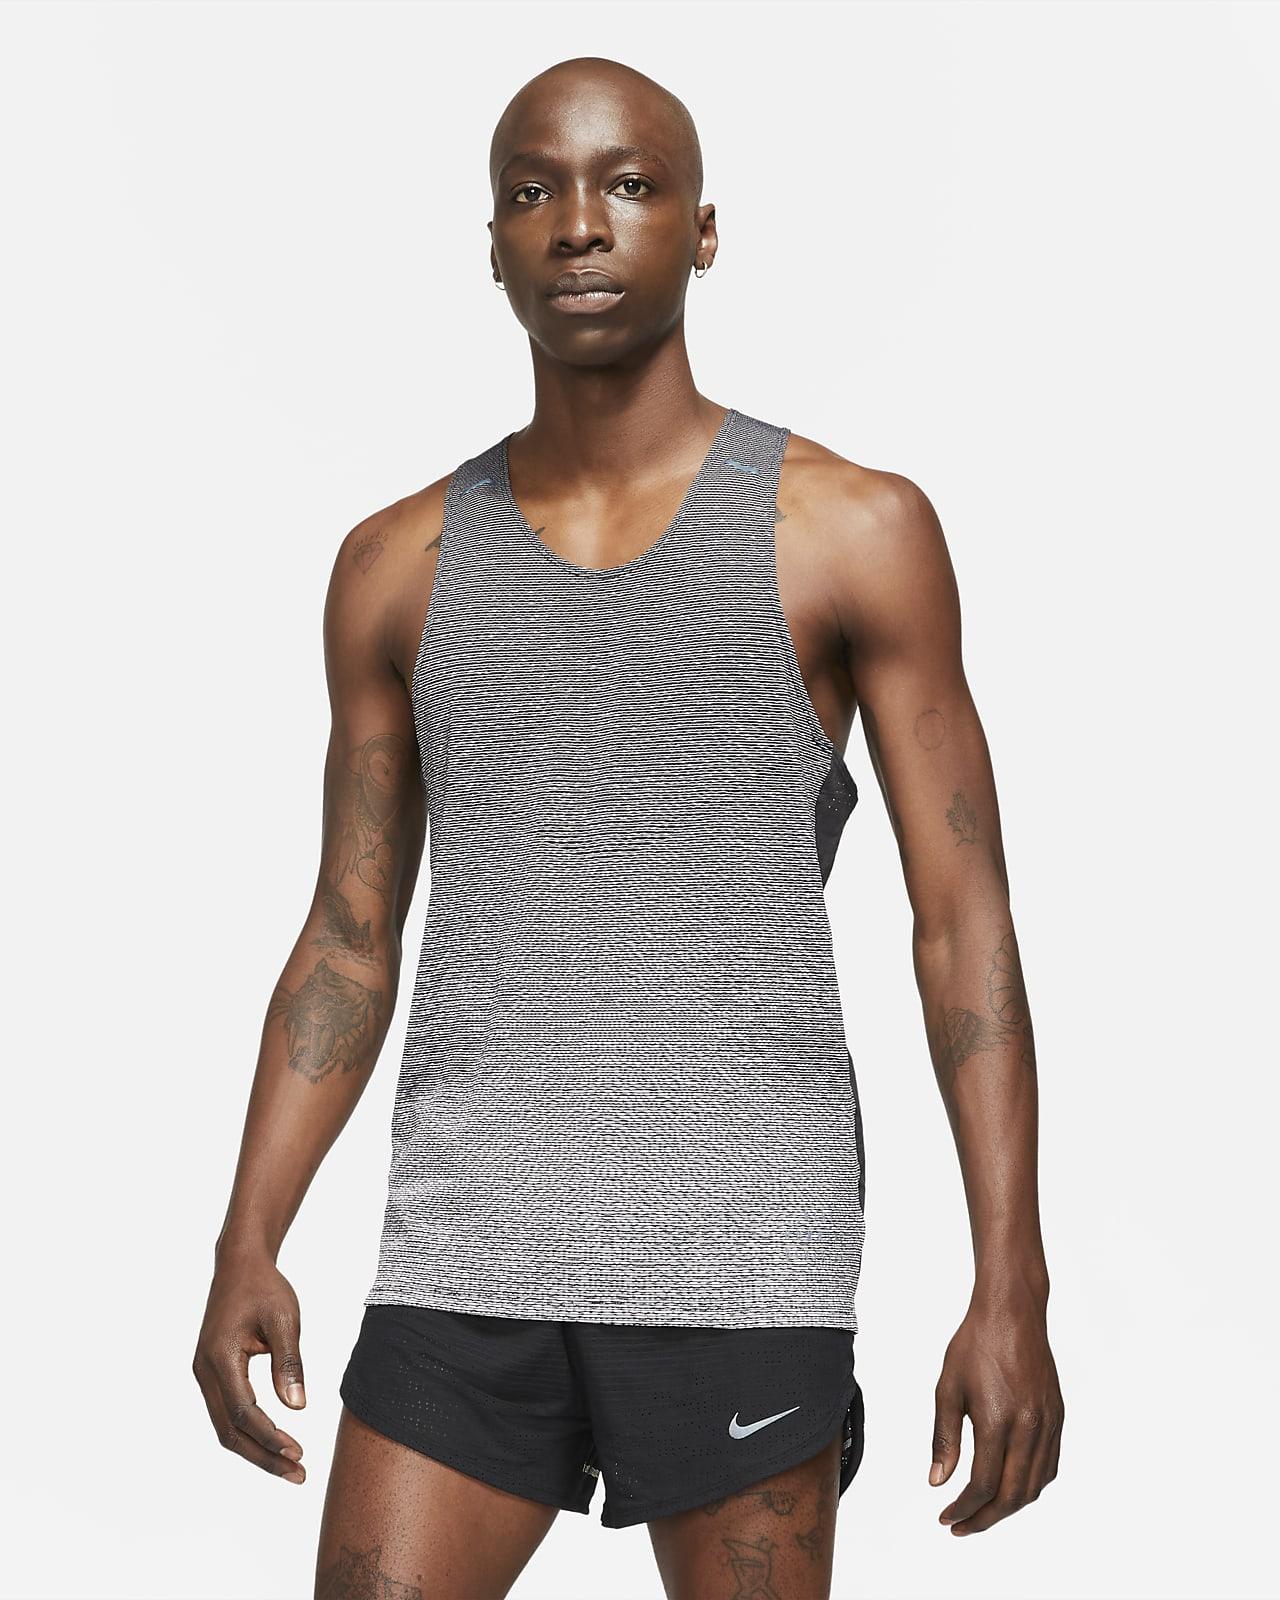 Nike Run Division Pinnacle Men's Running Tank